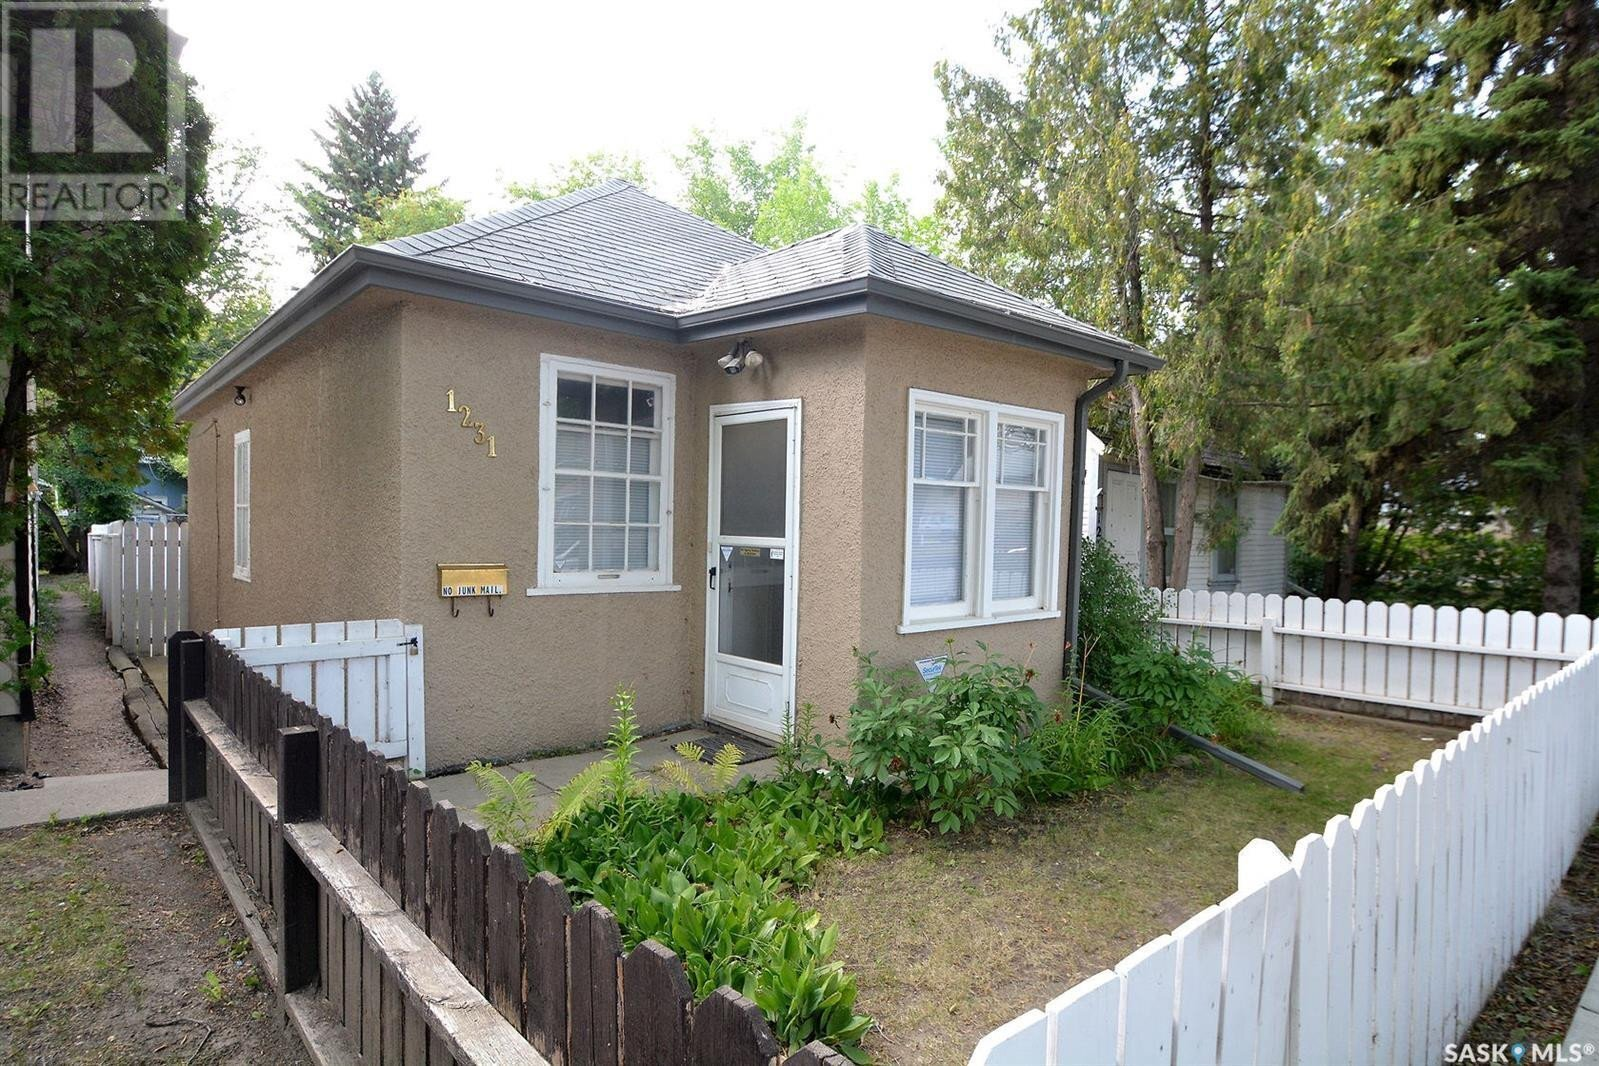 House for sale at 1231 D Ave N Saskatoon Saskatchewan - MLS: SK823608